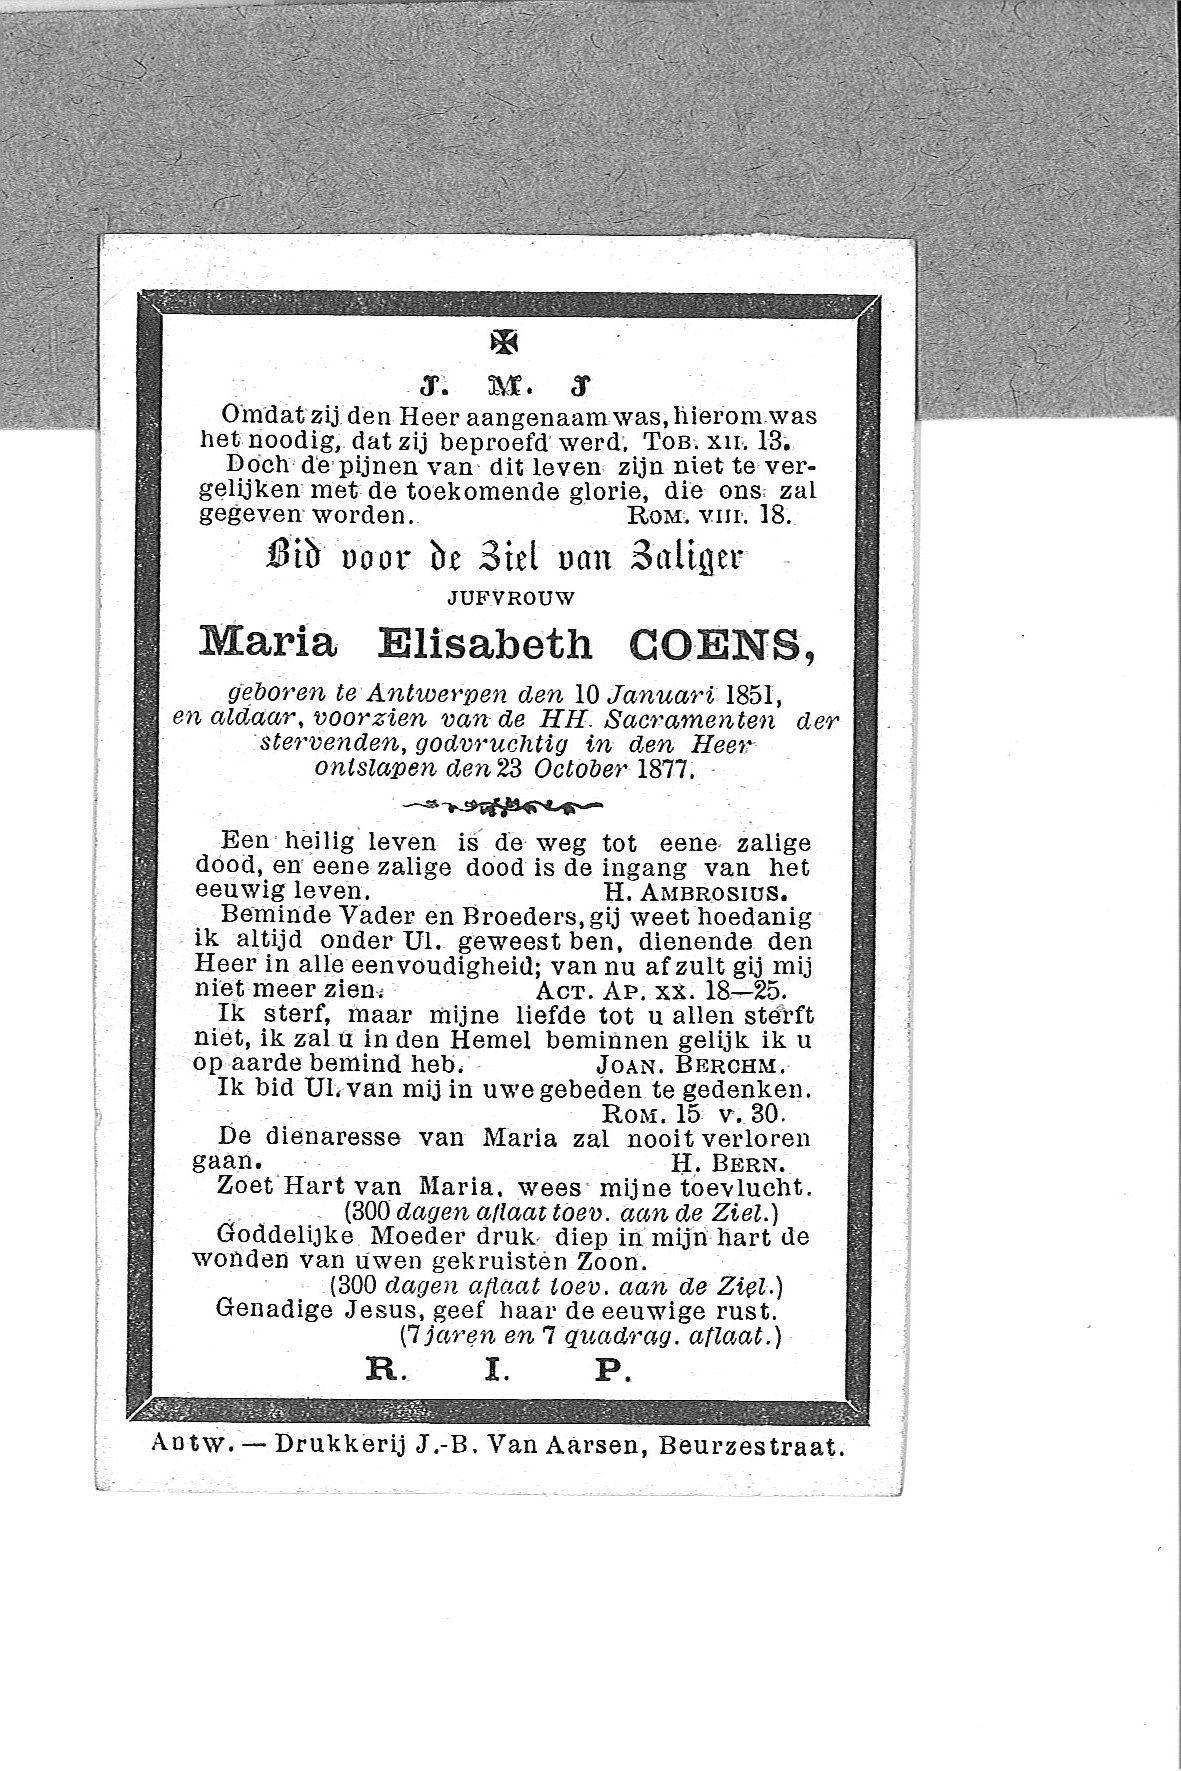 maria-elisabeth(1877)20090203111641_00026.jpg